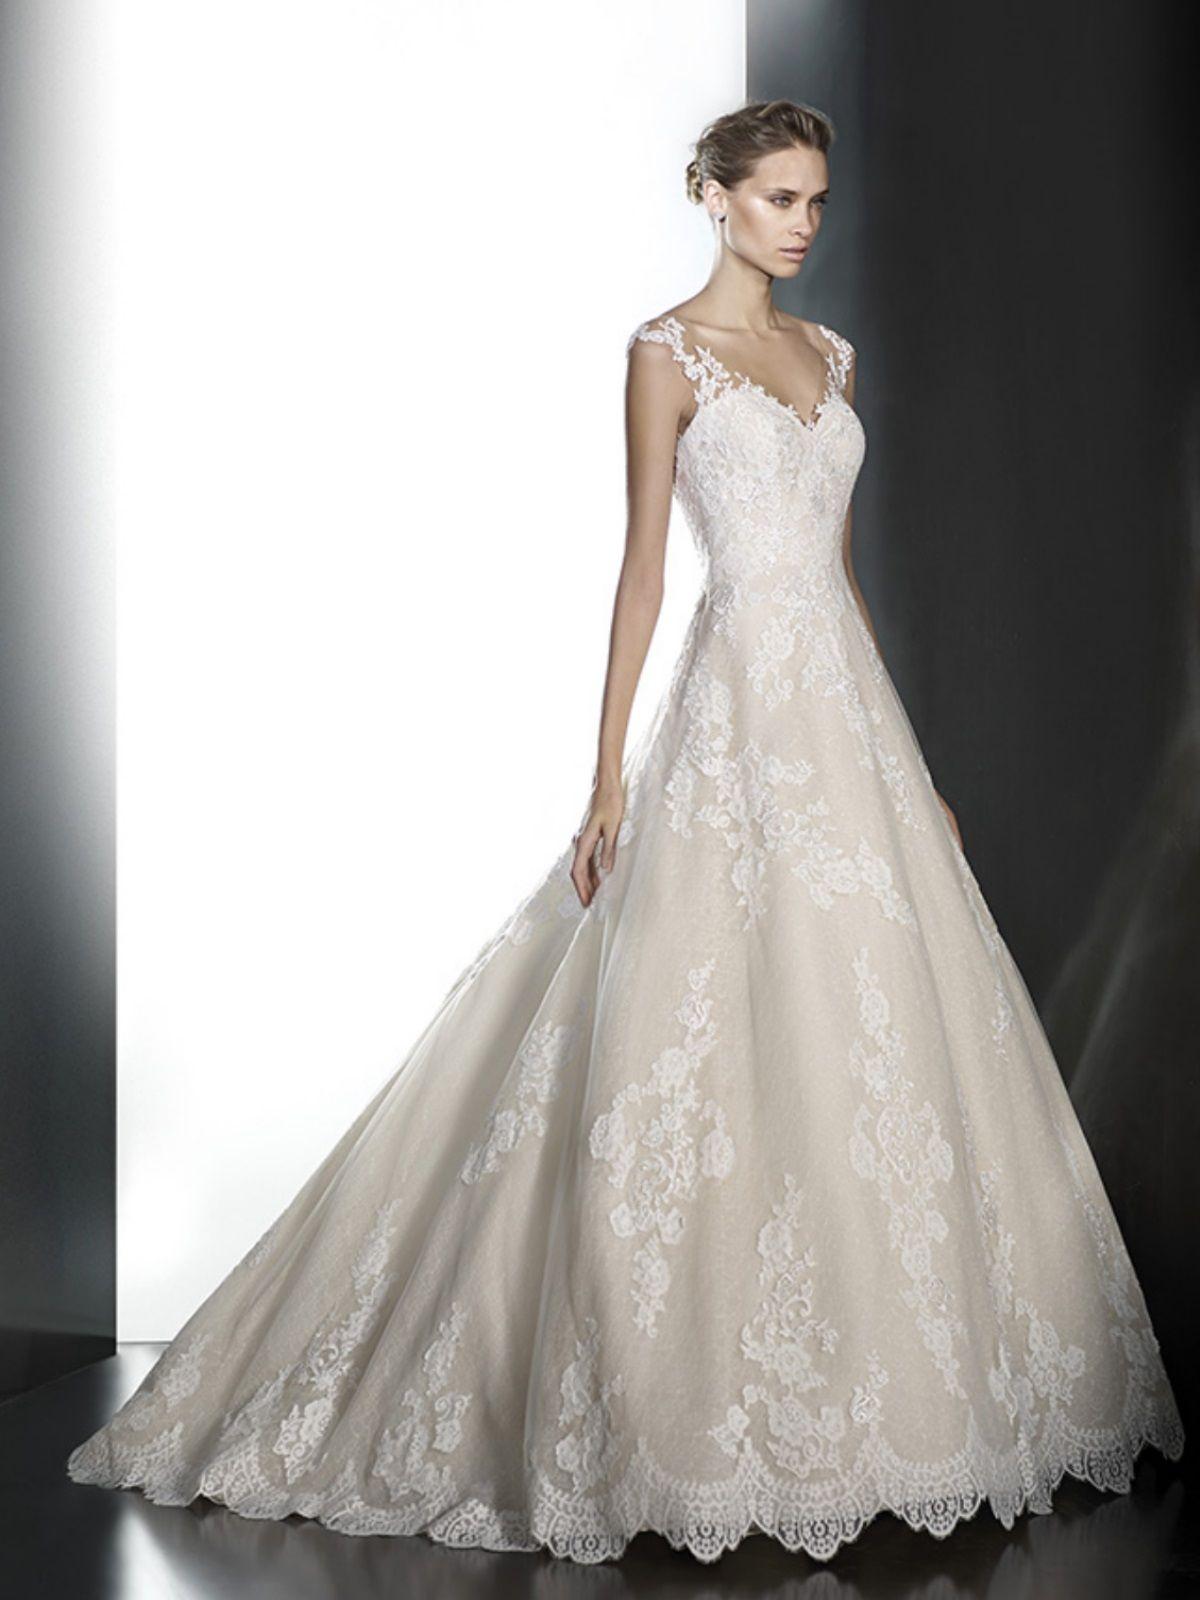 Primadona by Pronovias wedding gowns | PRONOVIAS Wedding Dresses ...